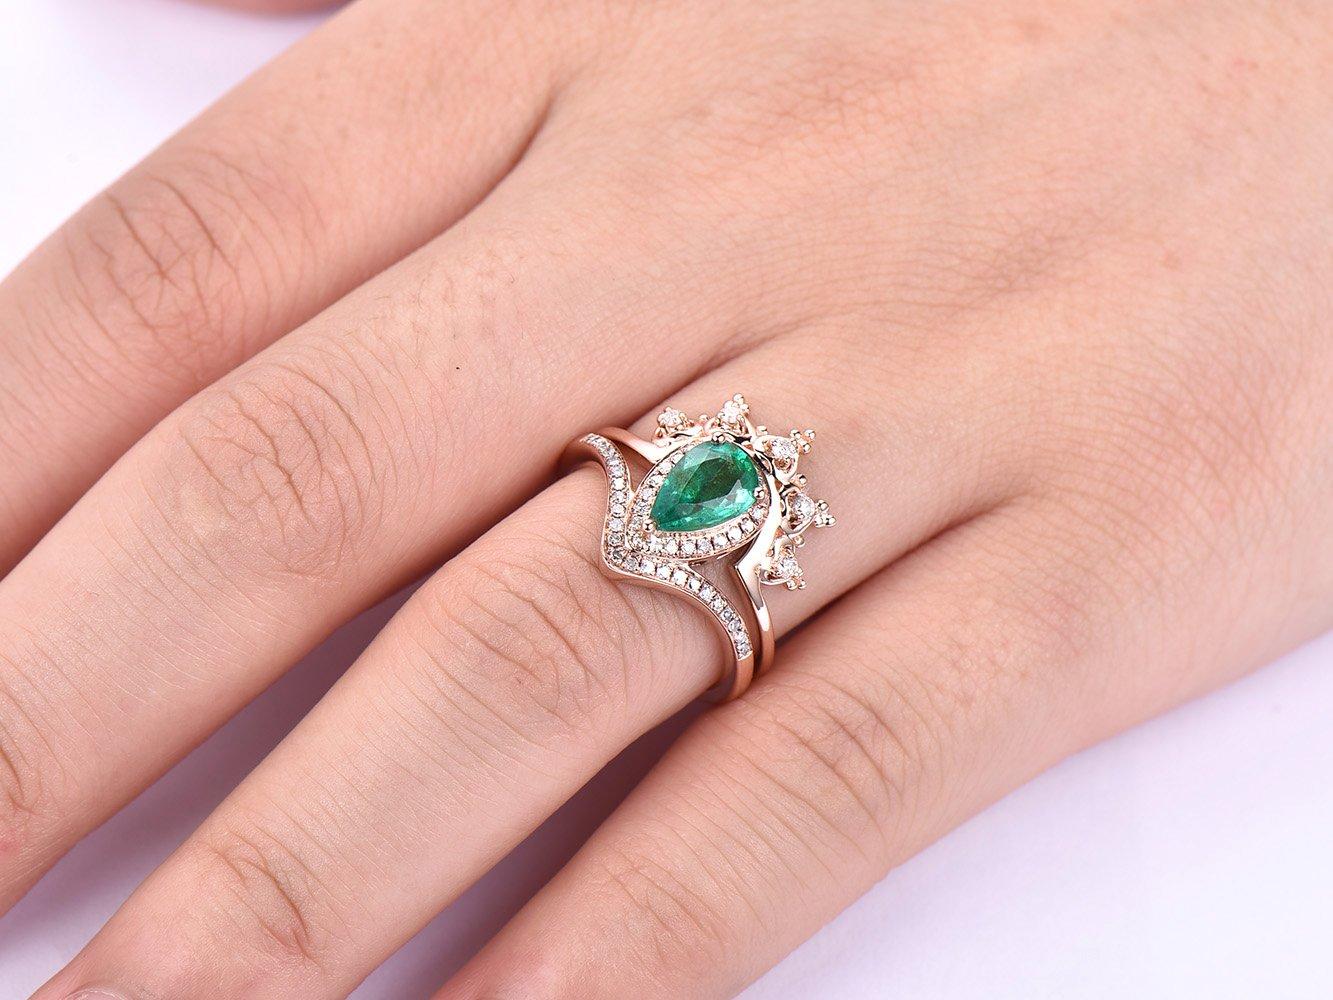 Amazon.com: Pear Emerald Engagement Ring Set Moissanite Band 14K ...